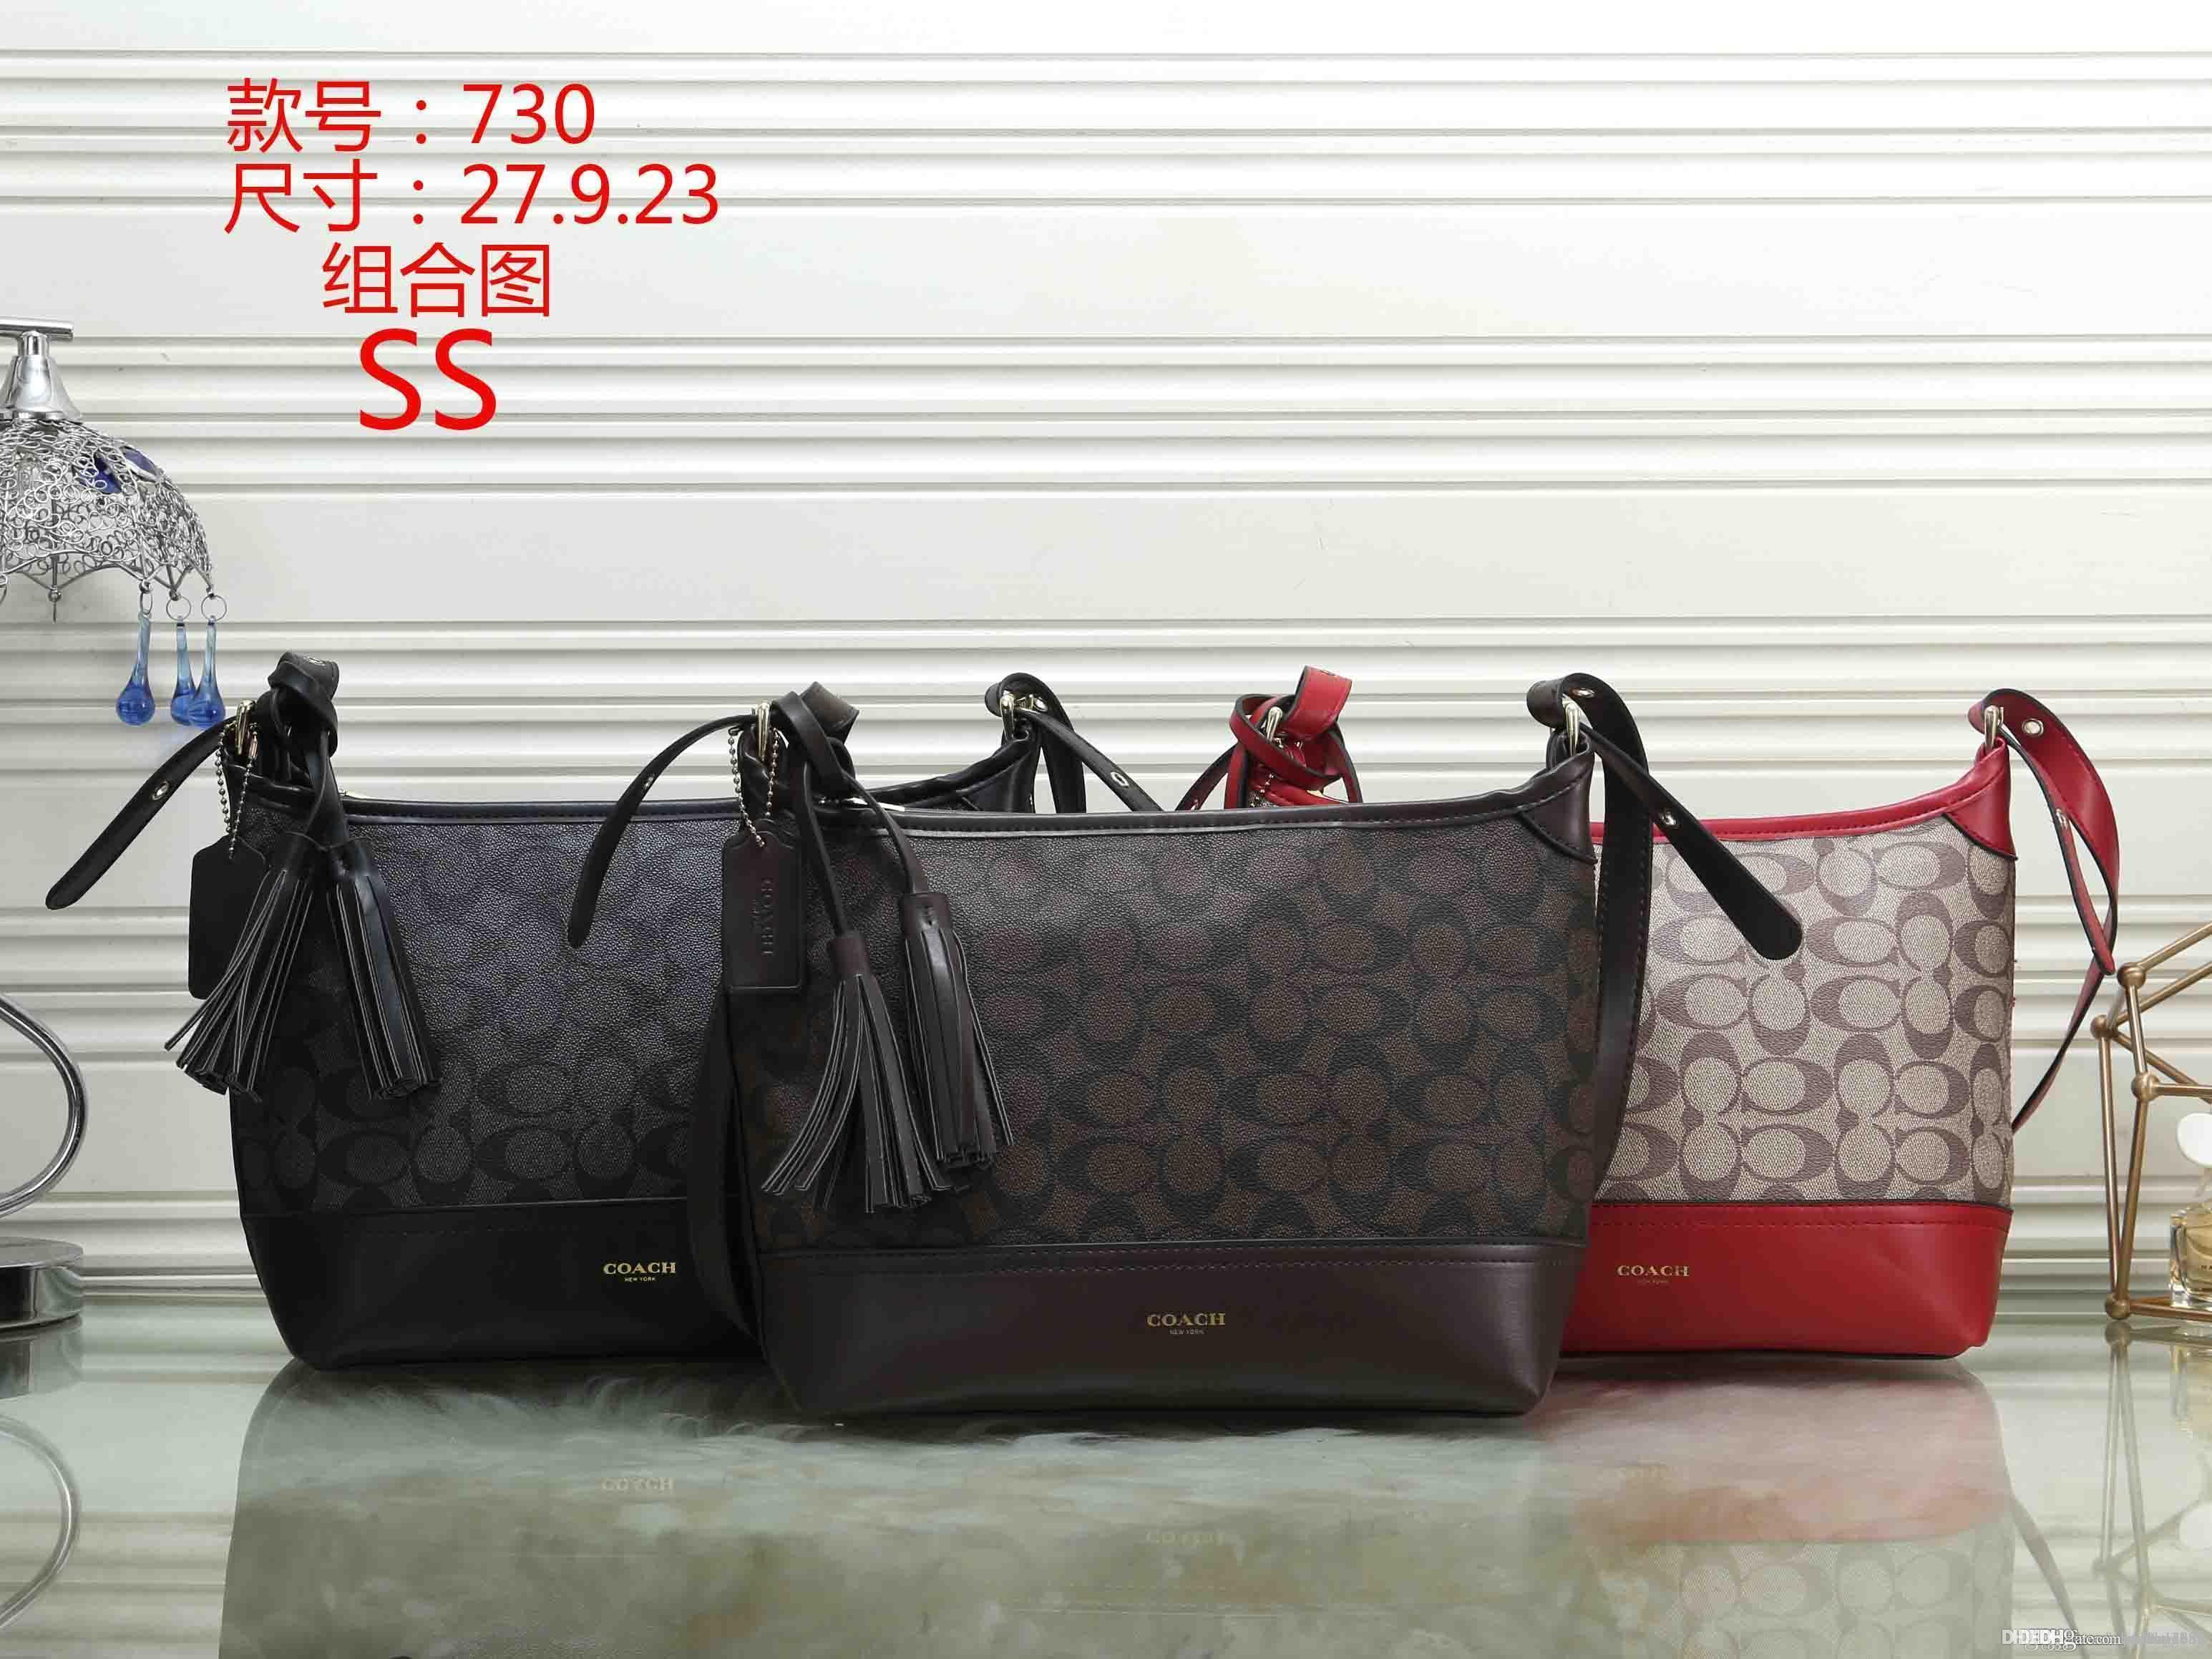 e3591e0768 2019 MK 730 SS NEW Styles Fashion Bags Ladies Handbags Designer Bags Women  Tote Bag Luxury Brands Bags Single Shoulder Bag From A1handbag